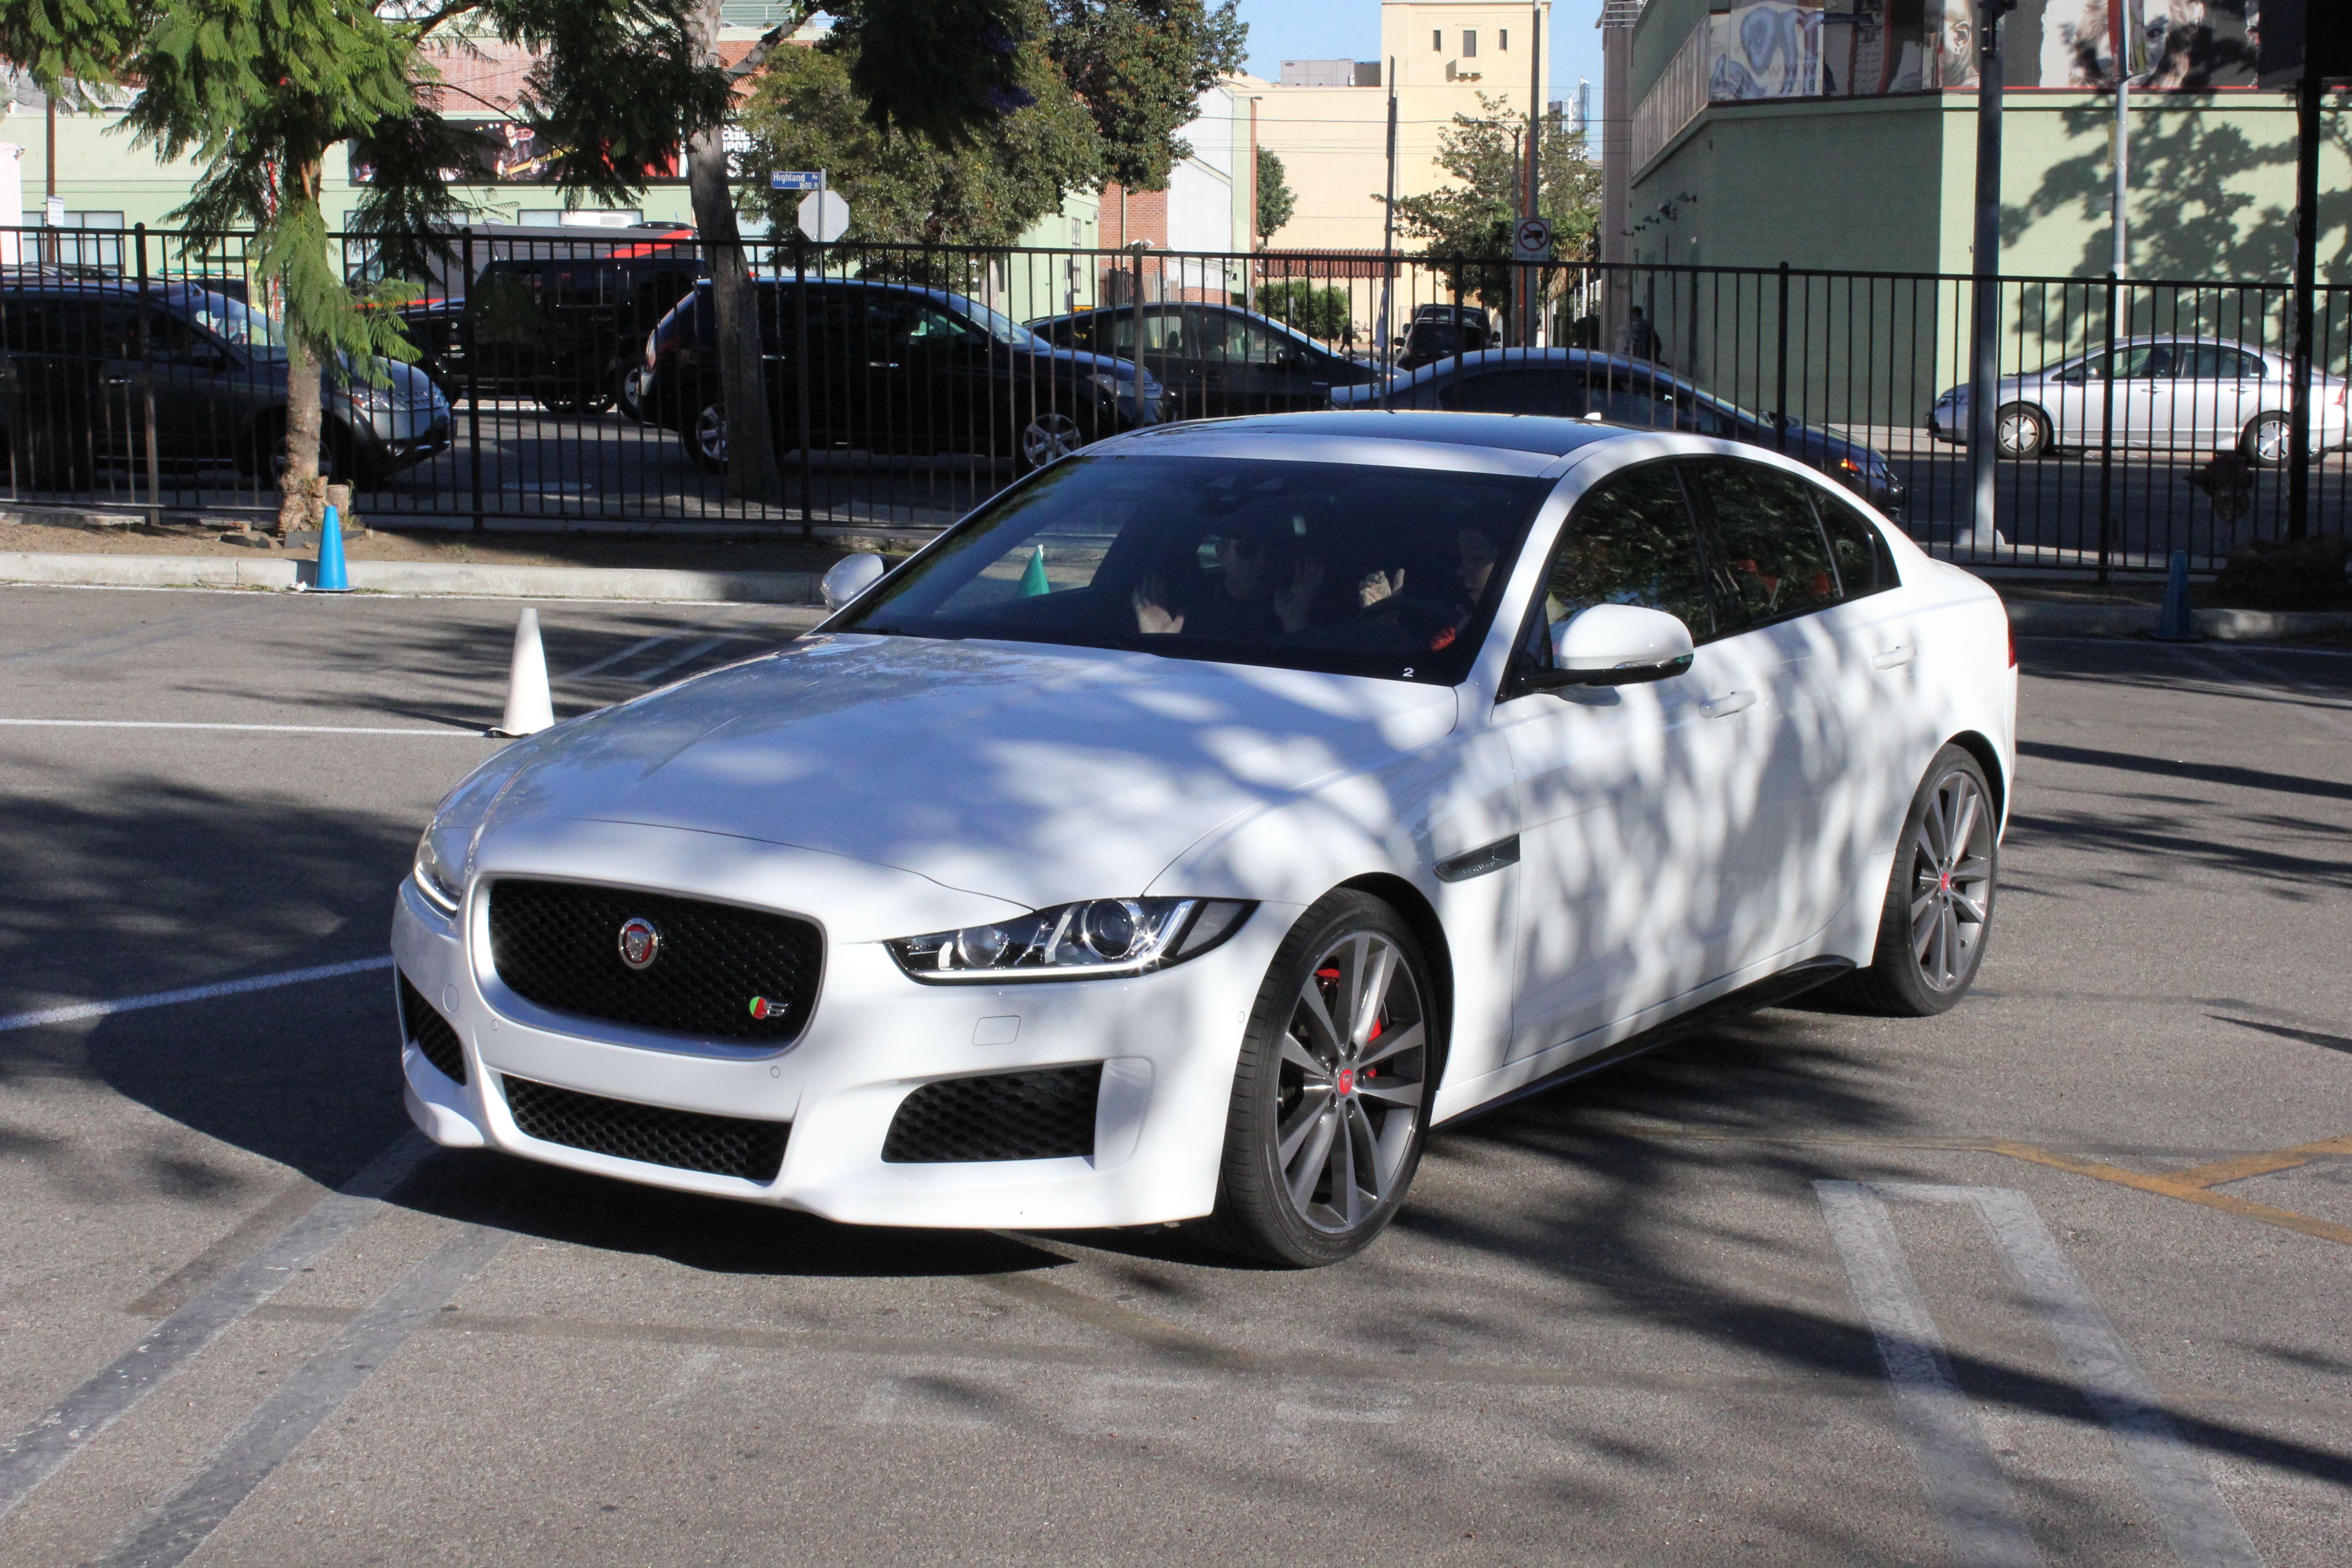 Jaguar's New 'Cat' In the Jungle